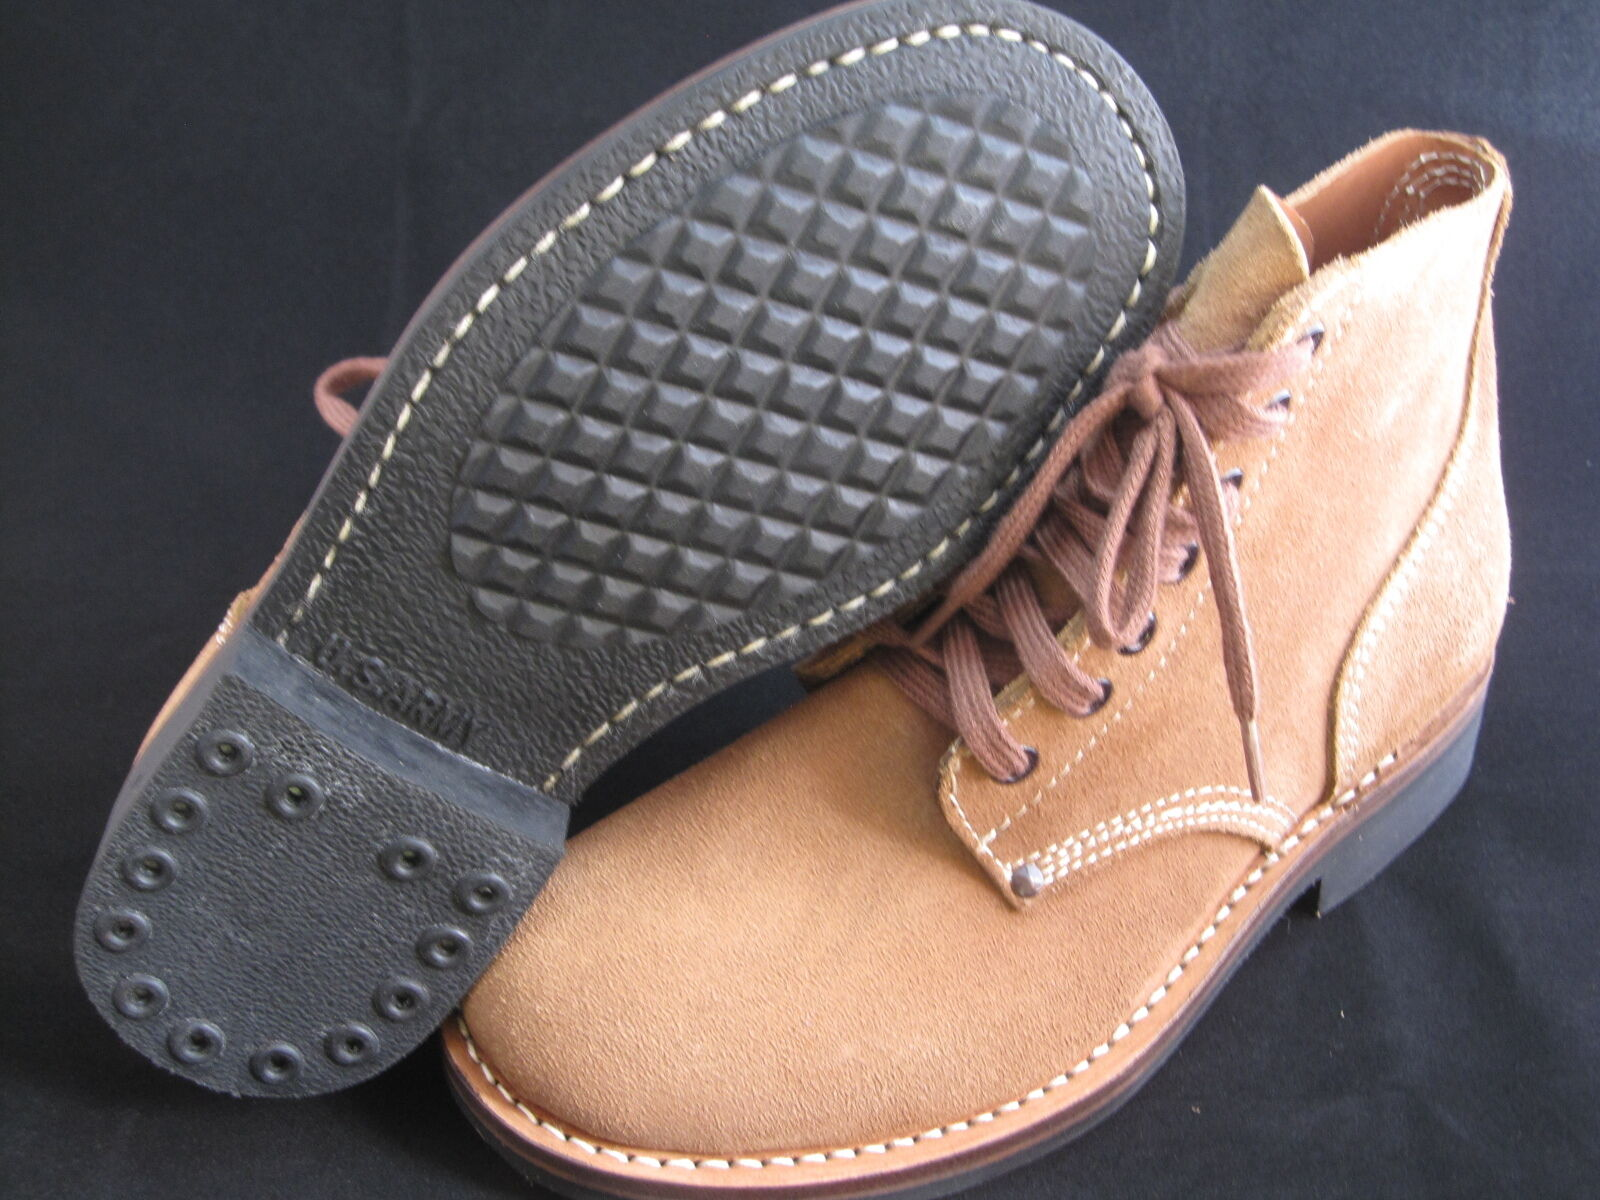 Lutece MFG Co Vintage Boots Rauh Leder Stiefel Rockabilly Steve McQueen Gr 6-13